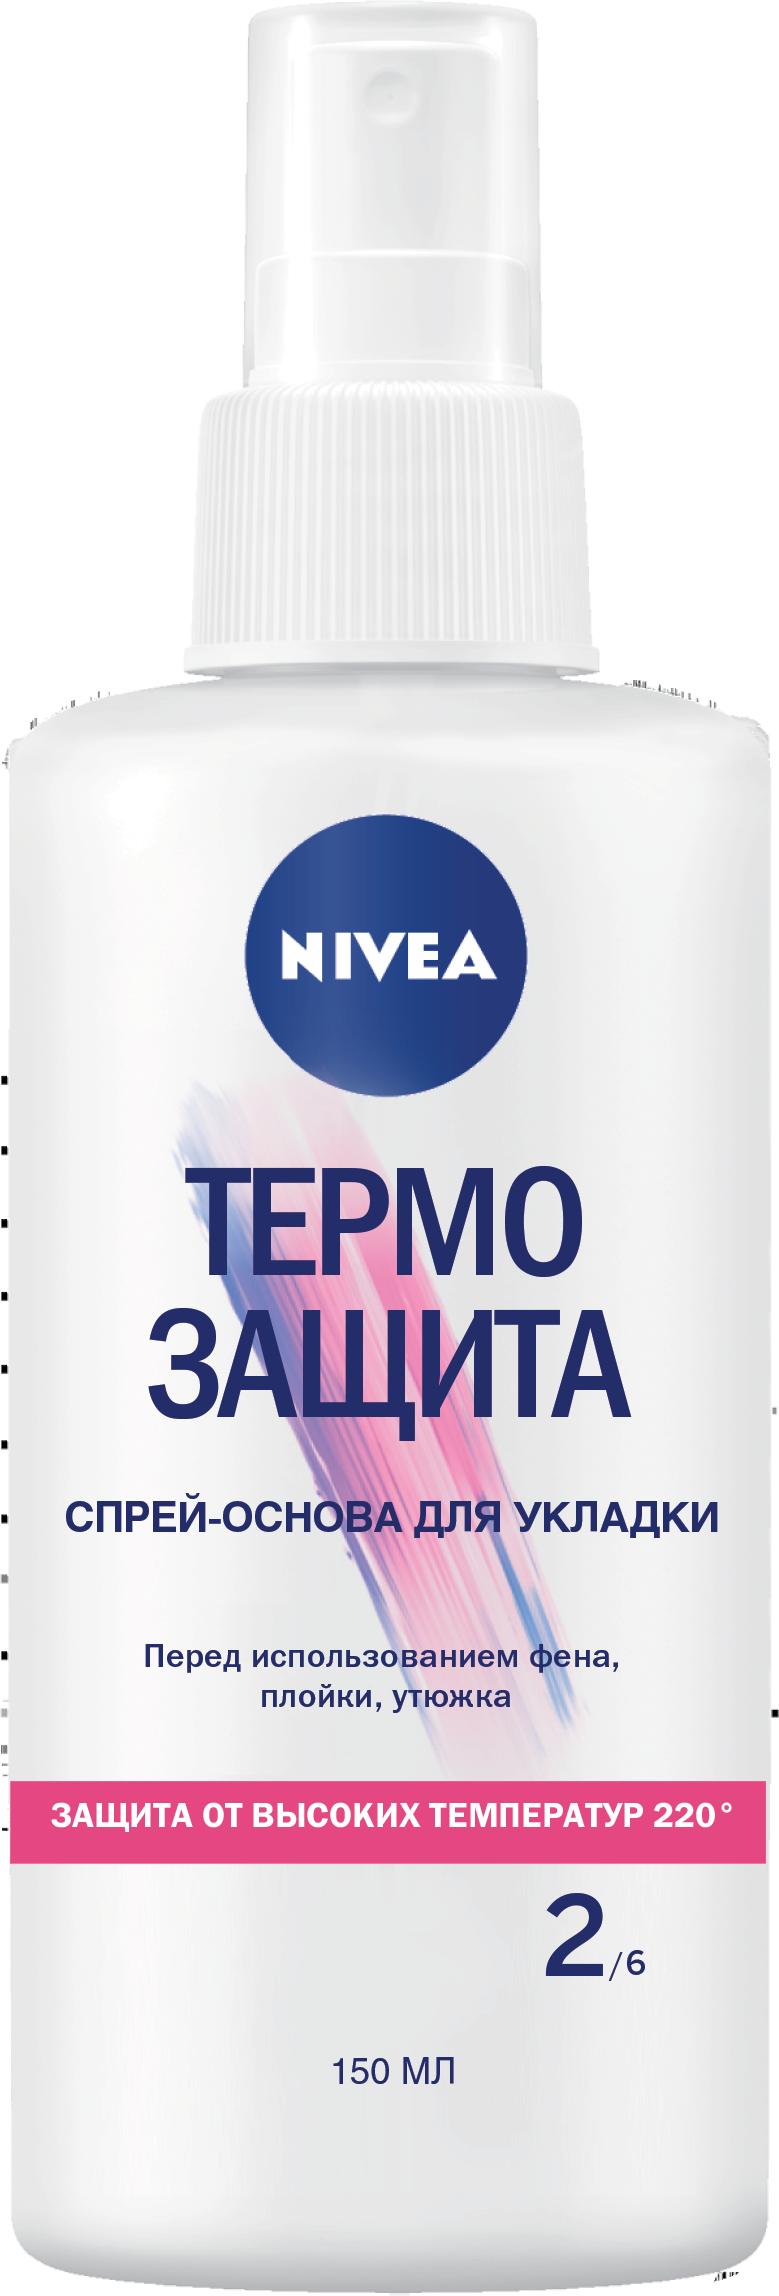 Купить Спрей-основа для укладки волос NIVEA ТЕРМО ЗАЩИТА 88629 150 мл